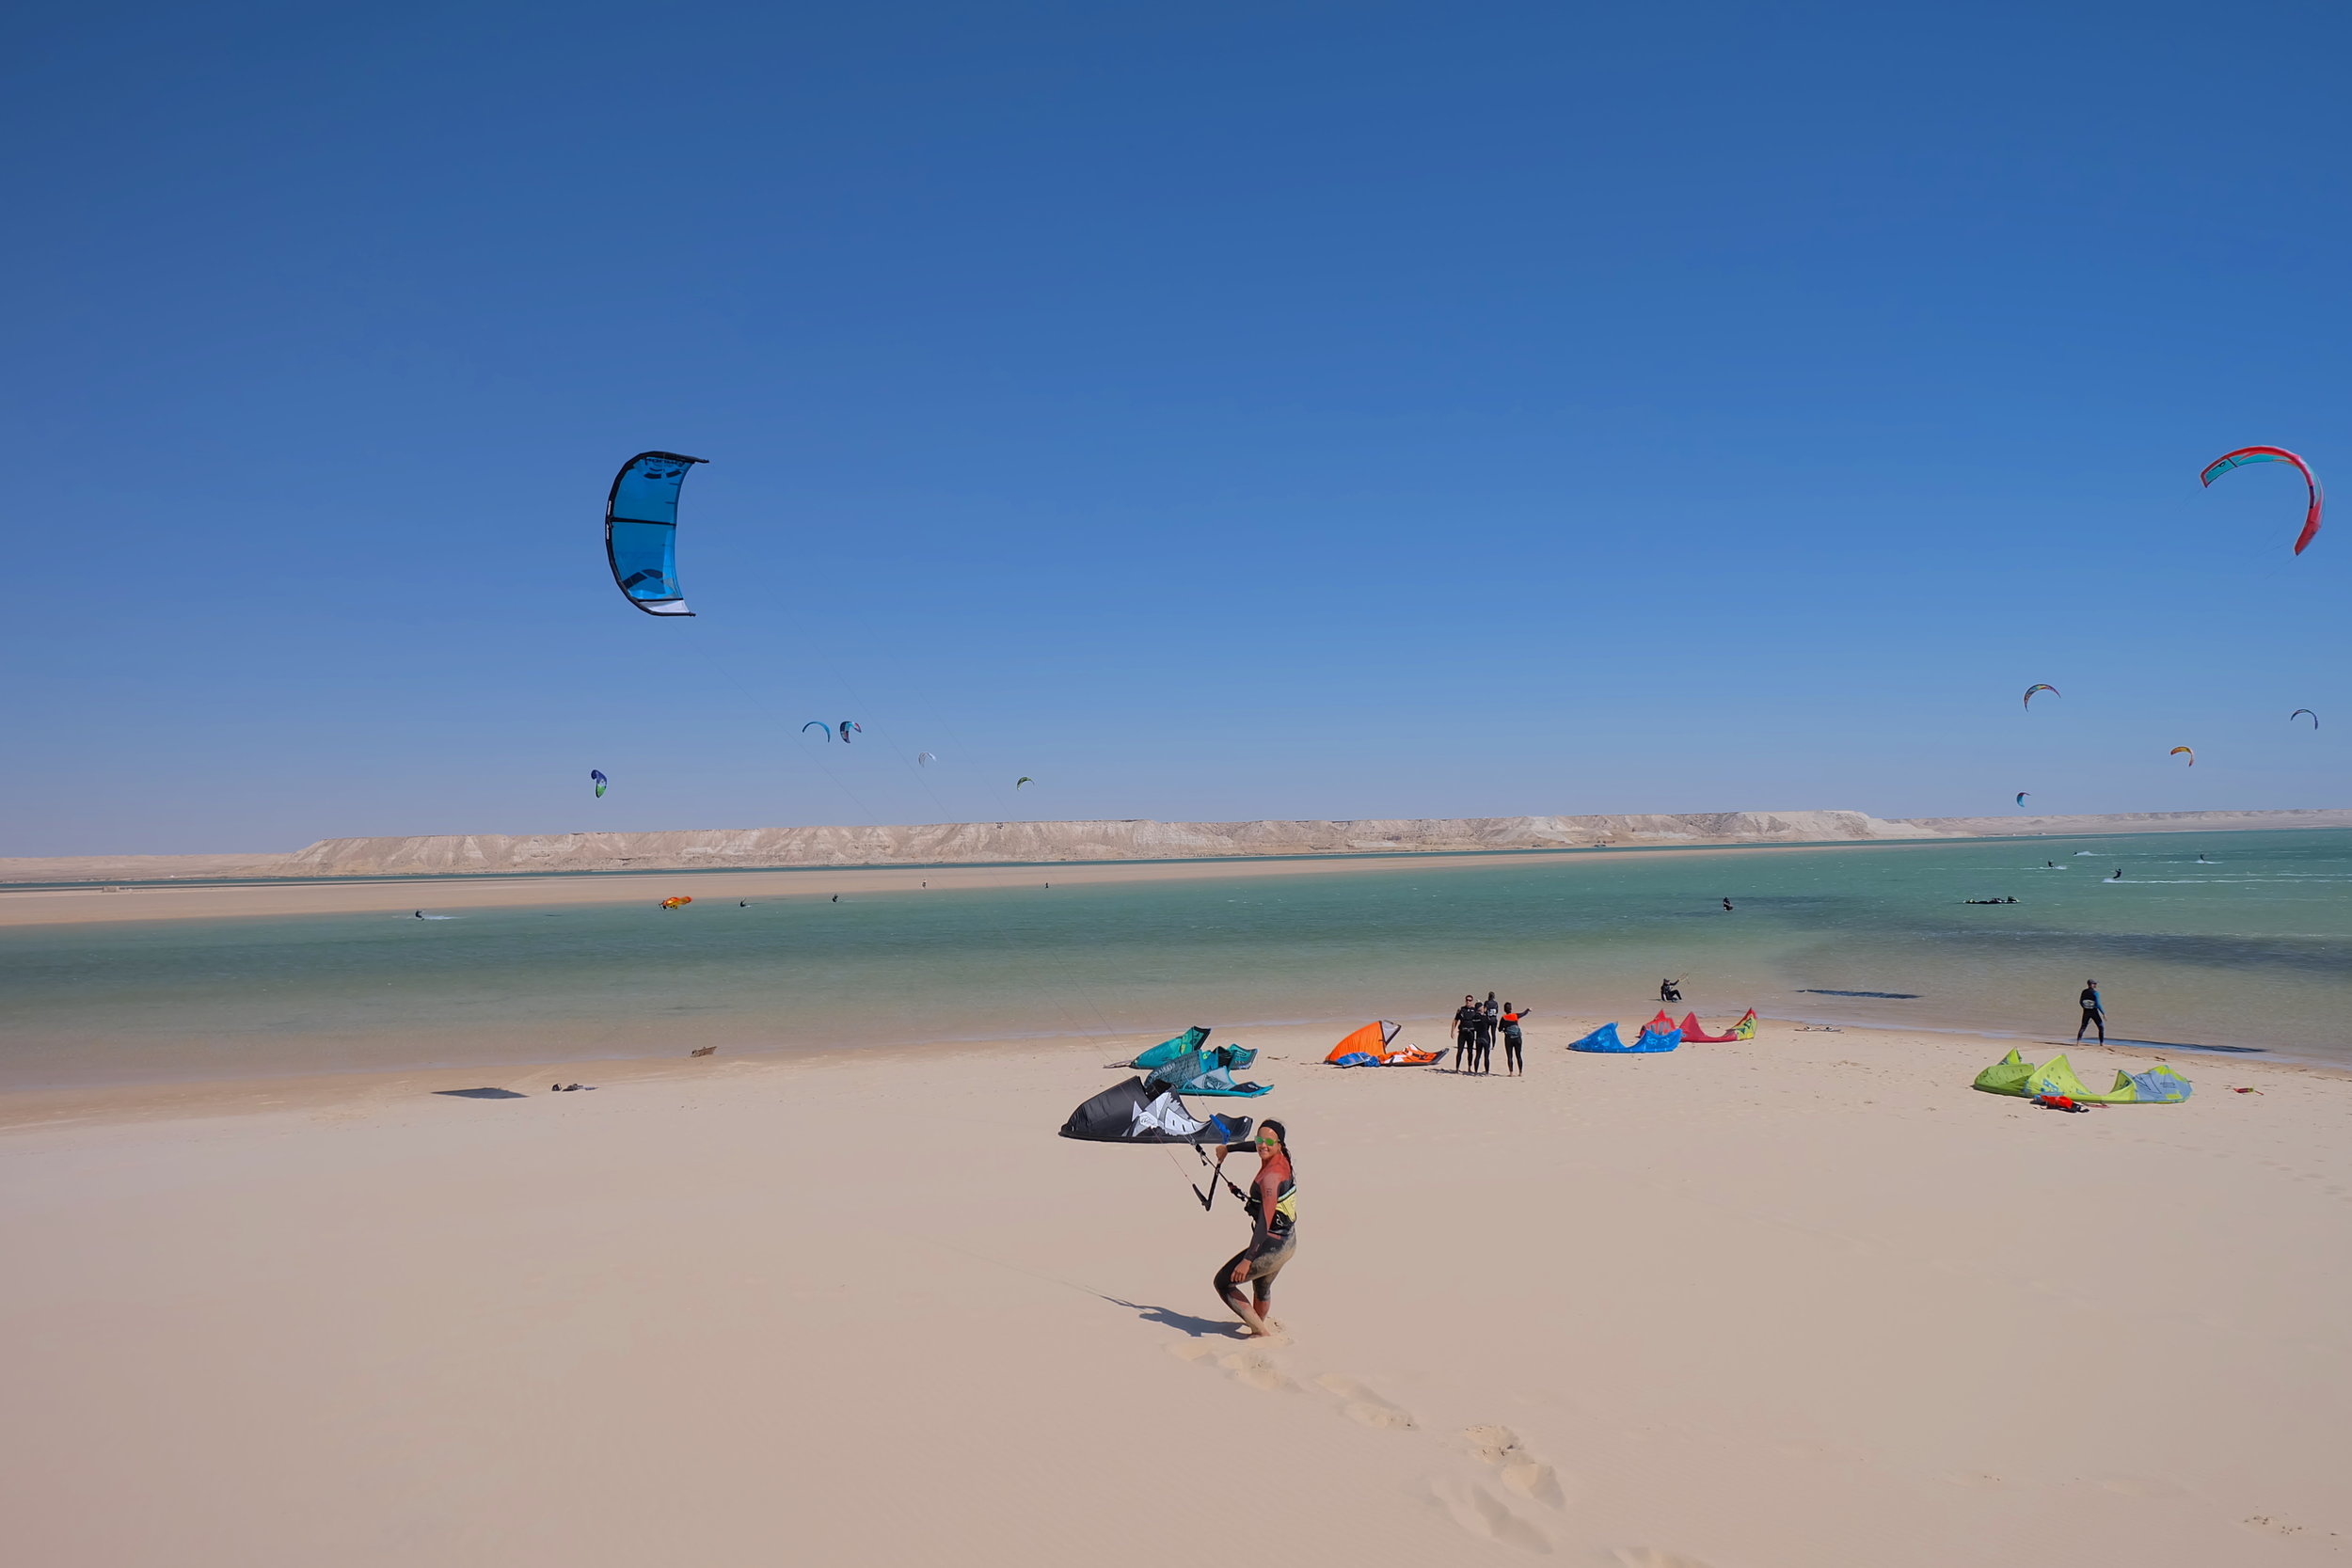 Kitesurf trip - Dakhla Morocco - Kite Control.JPG